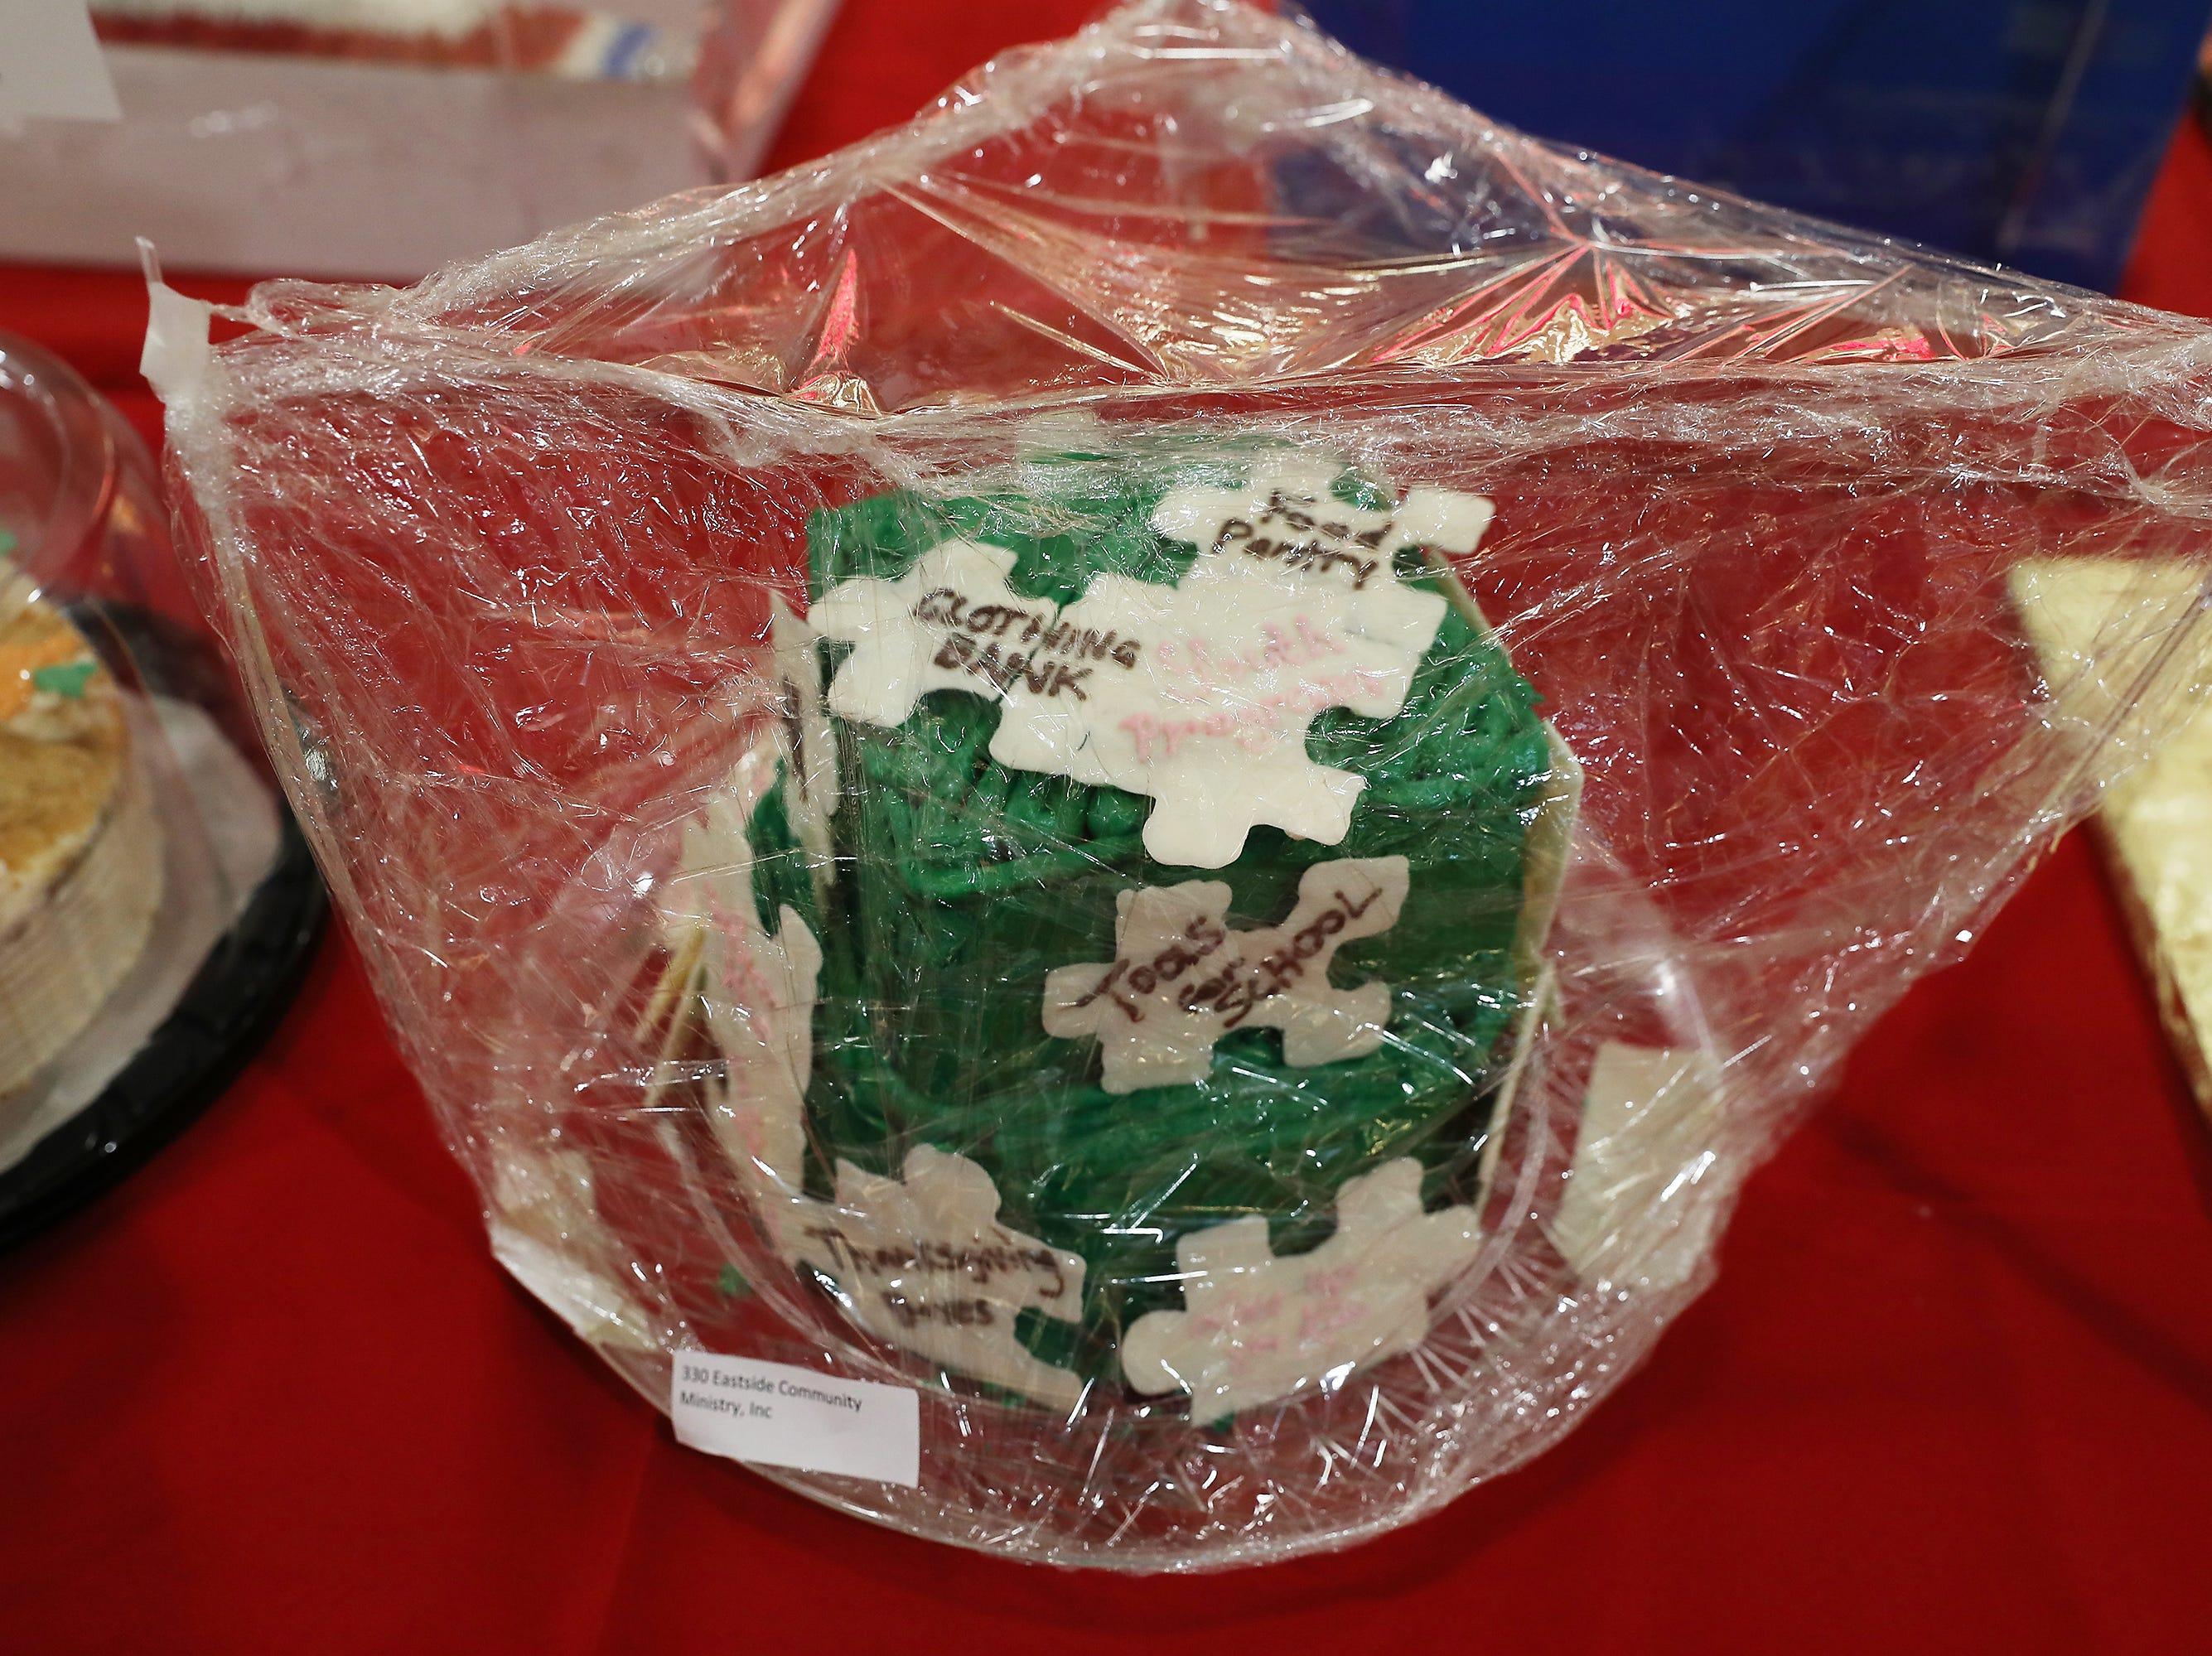 2:15 P.M. Friday cake 330 Eastside Community Ministry - Six custom Eastside puzzles; $100